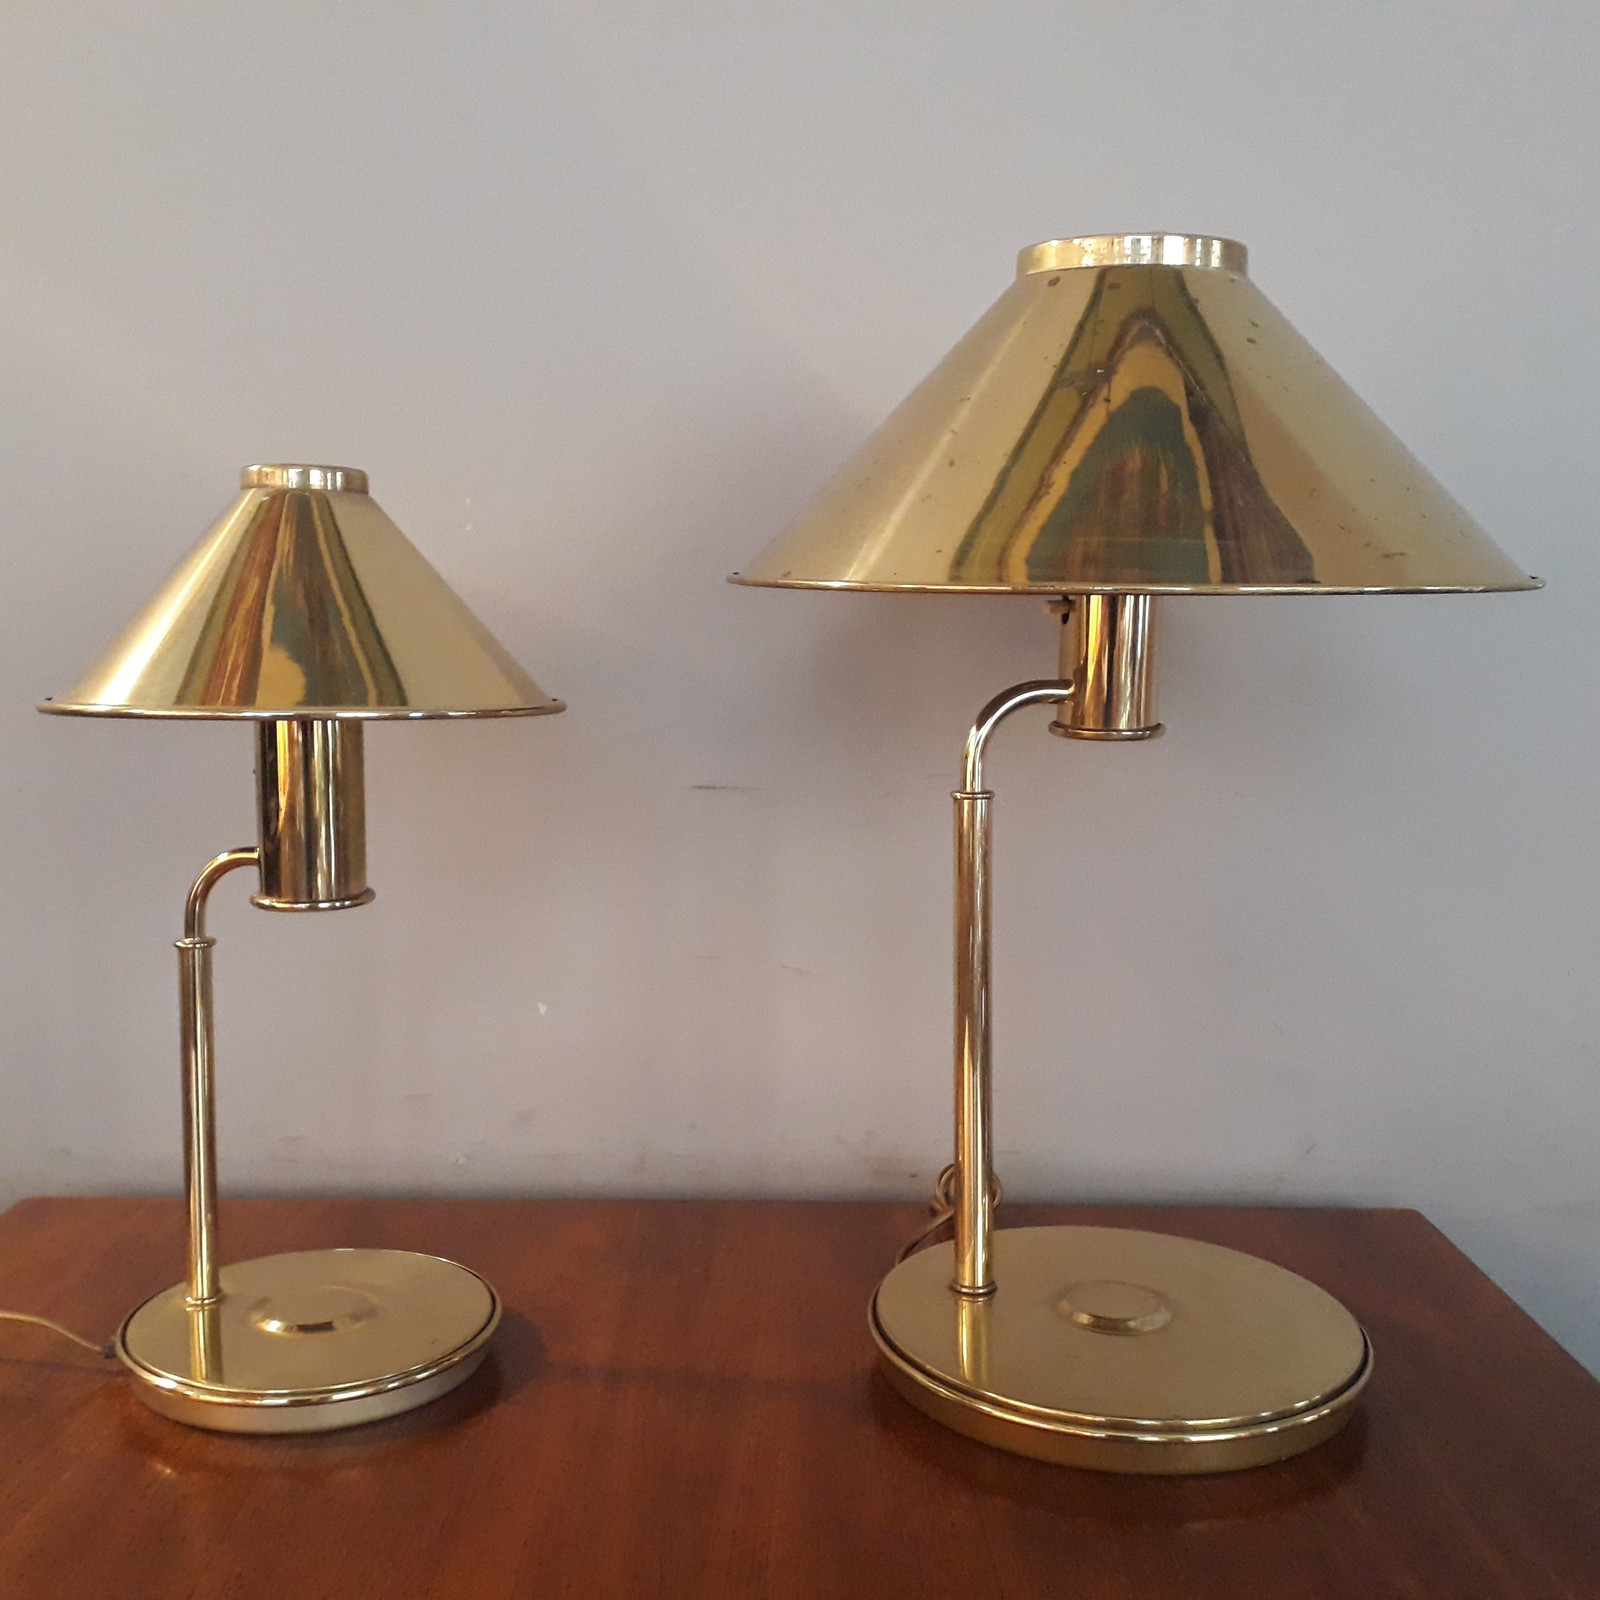 Retro vintage bordlampe. Høvik +Hadeland. | FINN.no